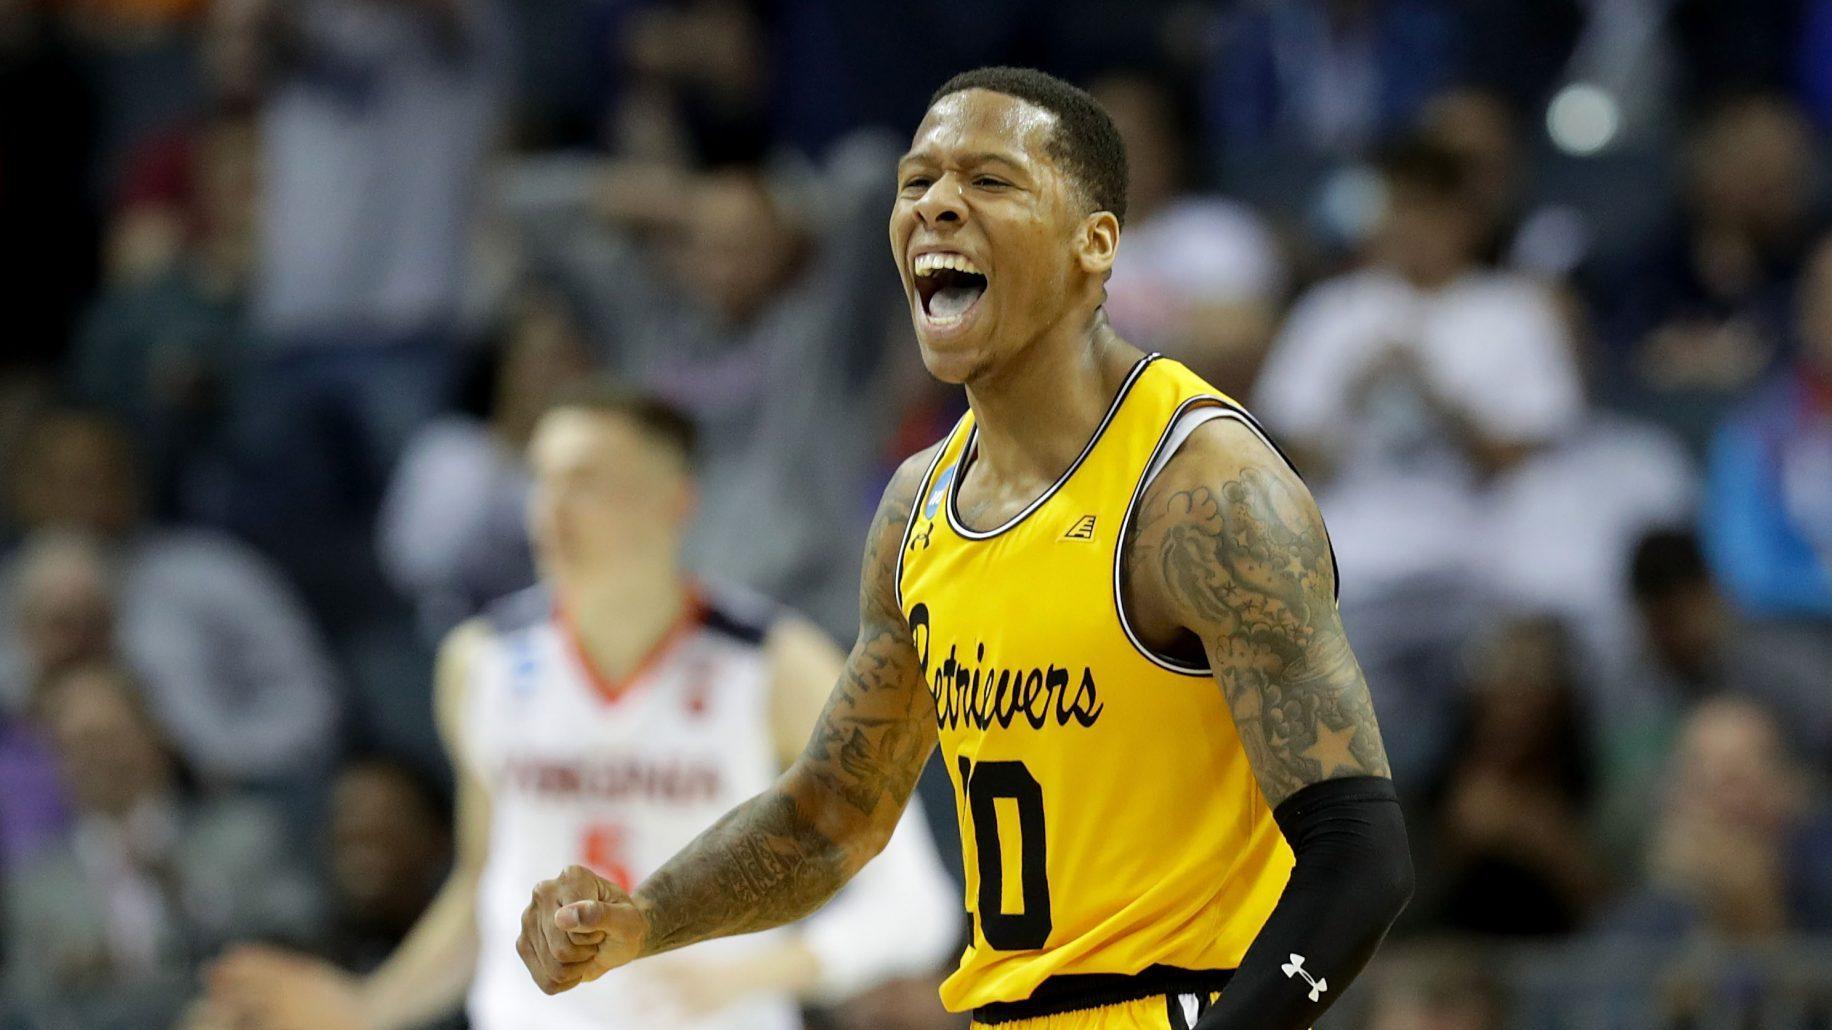 2018 NCAA Tournament: UMBC shocks the world on historic day 2